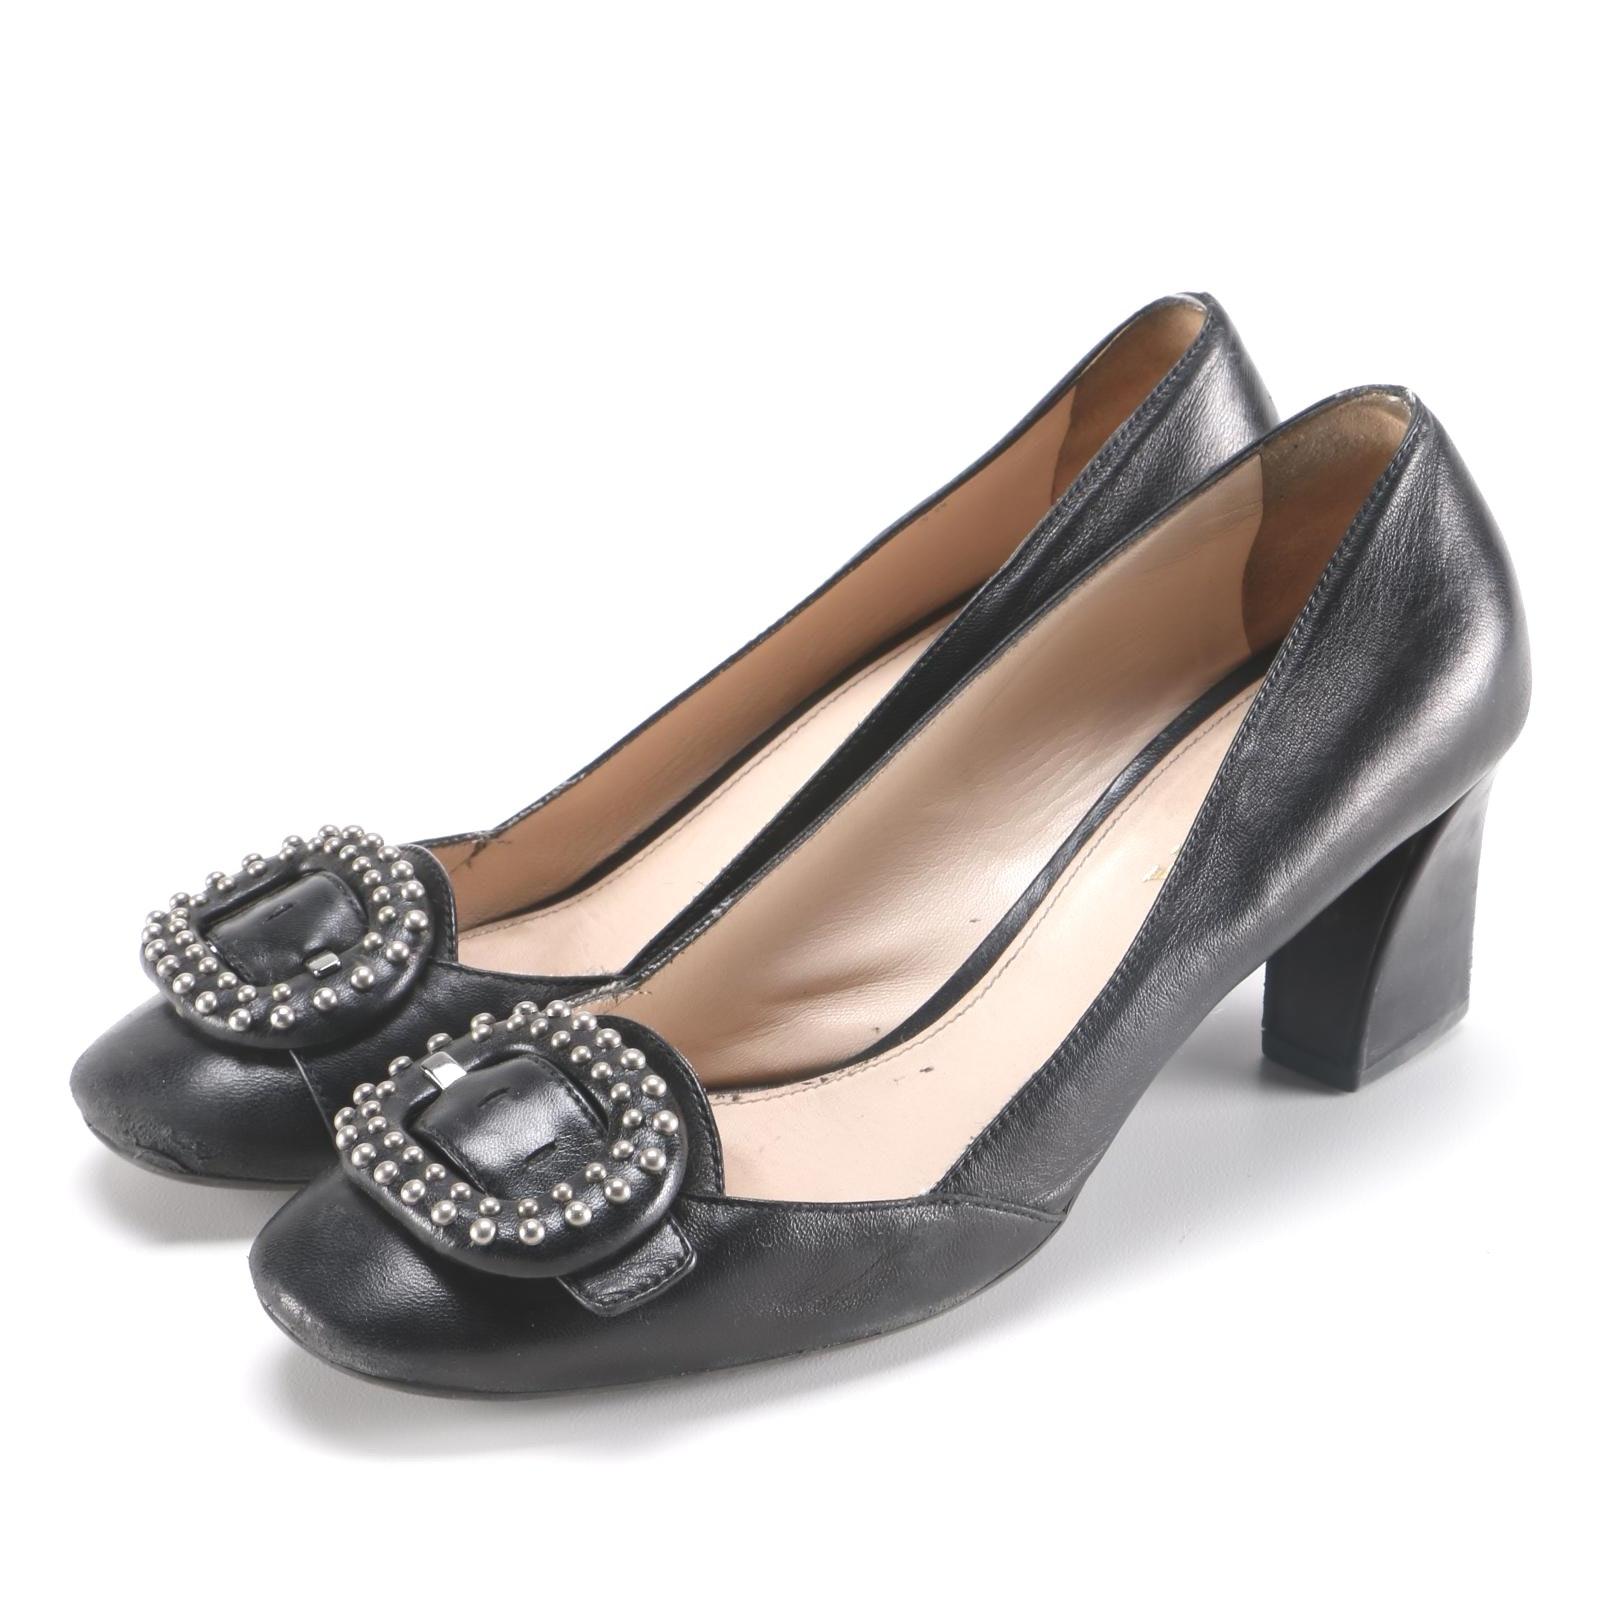 Prada Calzature Donna Black Leather Pumps